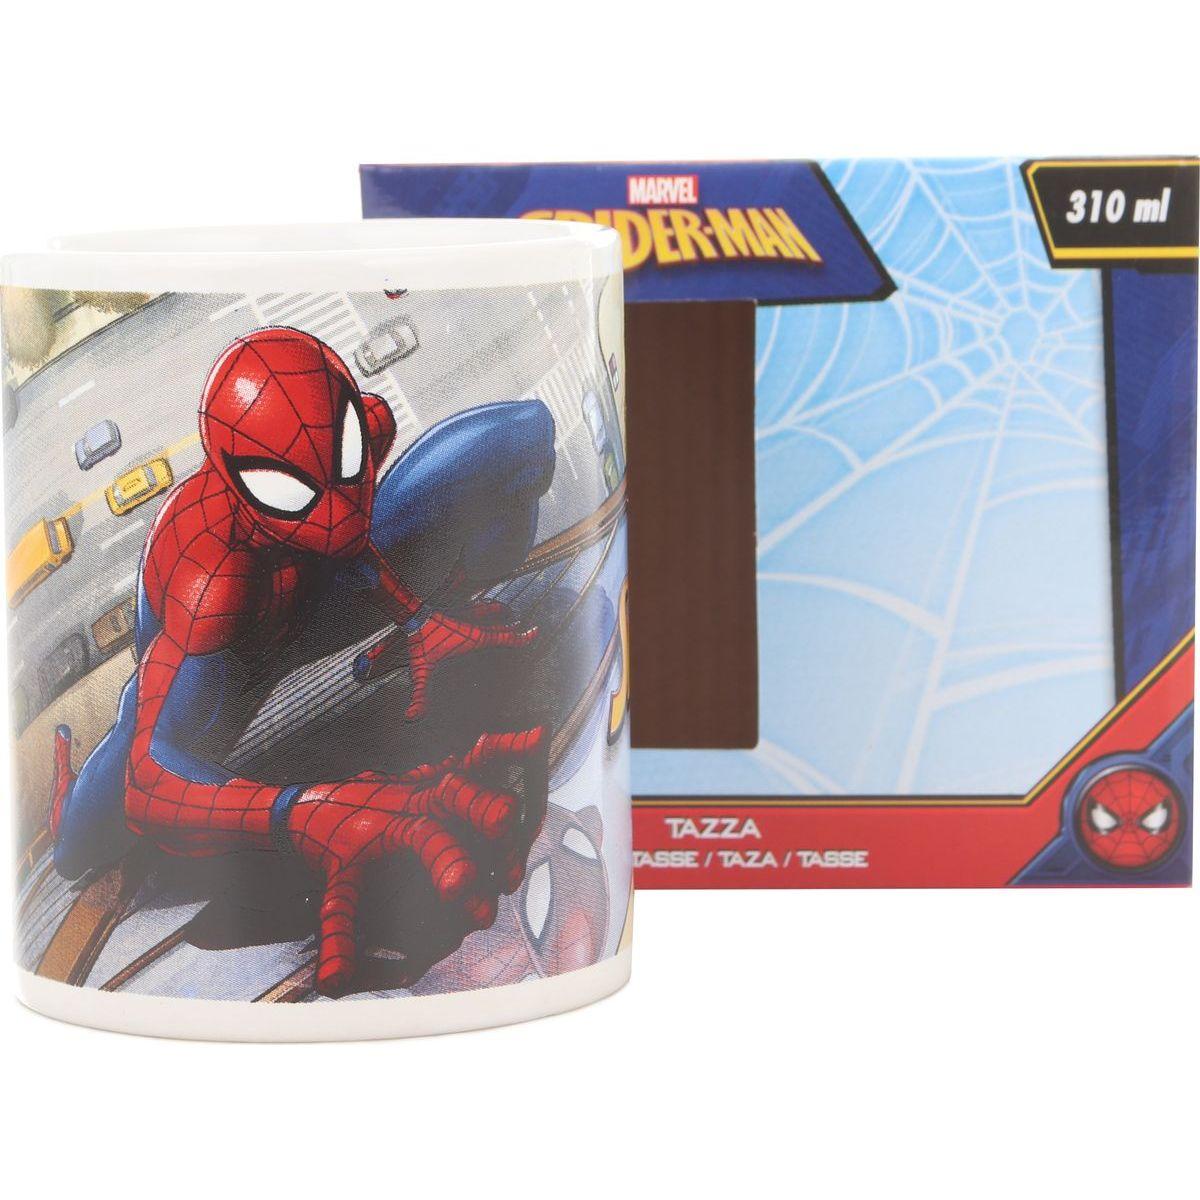 Keramický hrneček Marvel Spiderman 310 ml